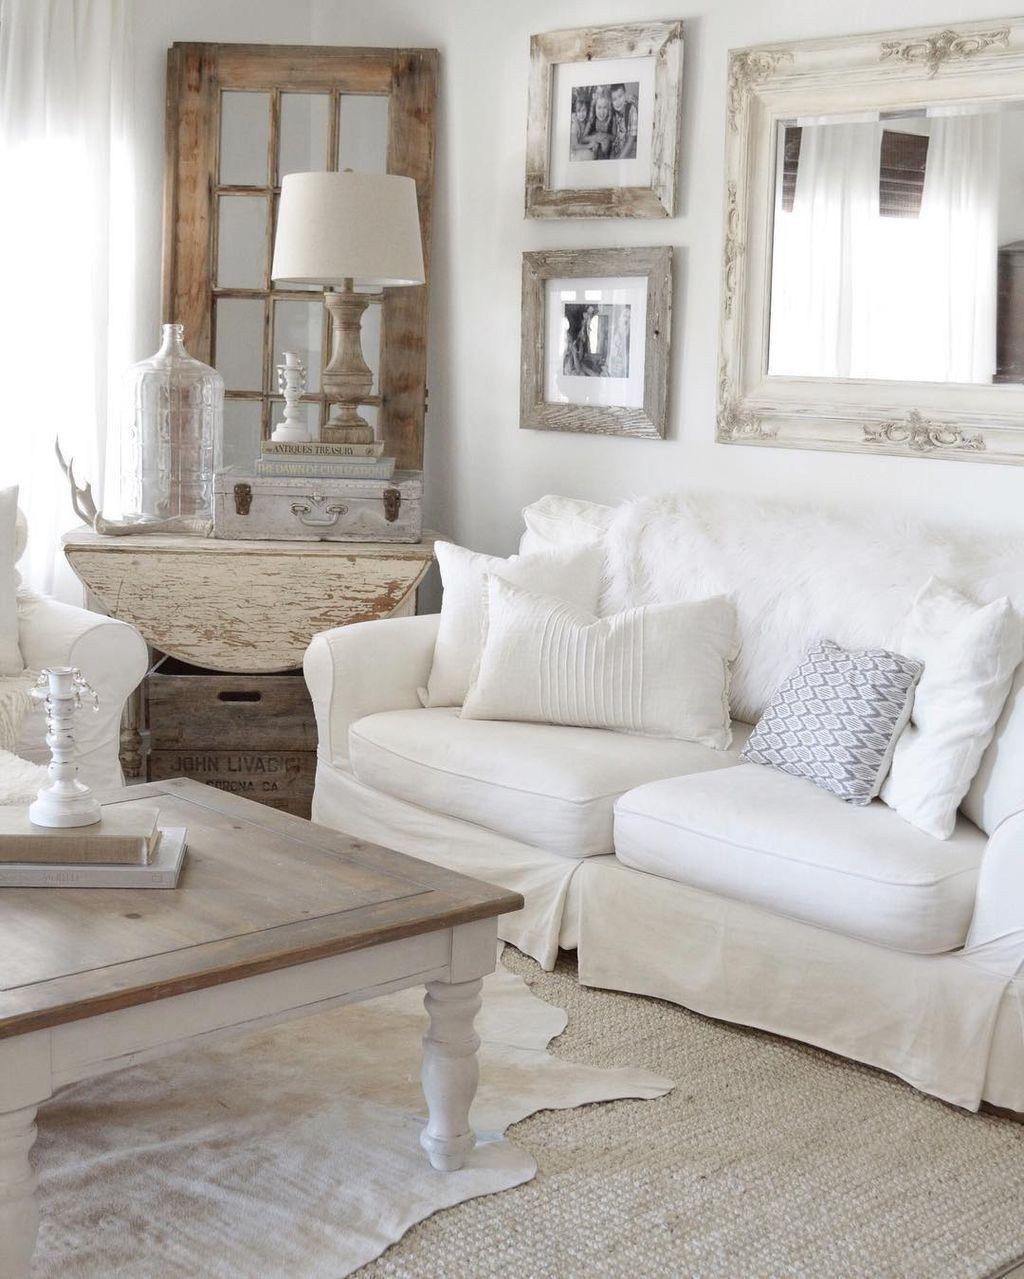 88 Enchanted Shabby Chic Living Room Decoration Ideas   Shabby chic ...